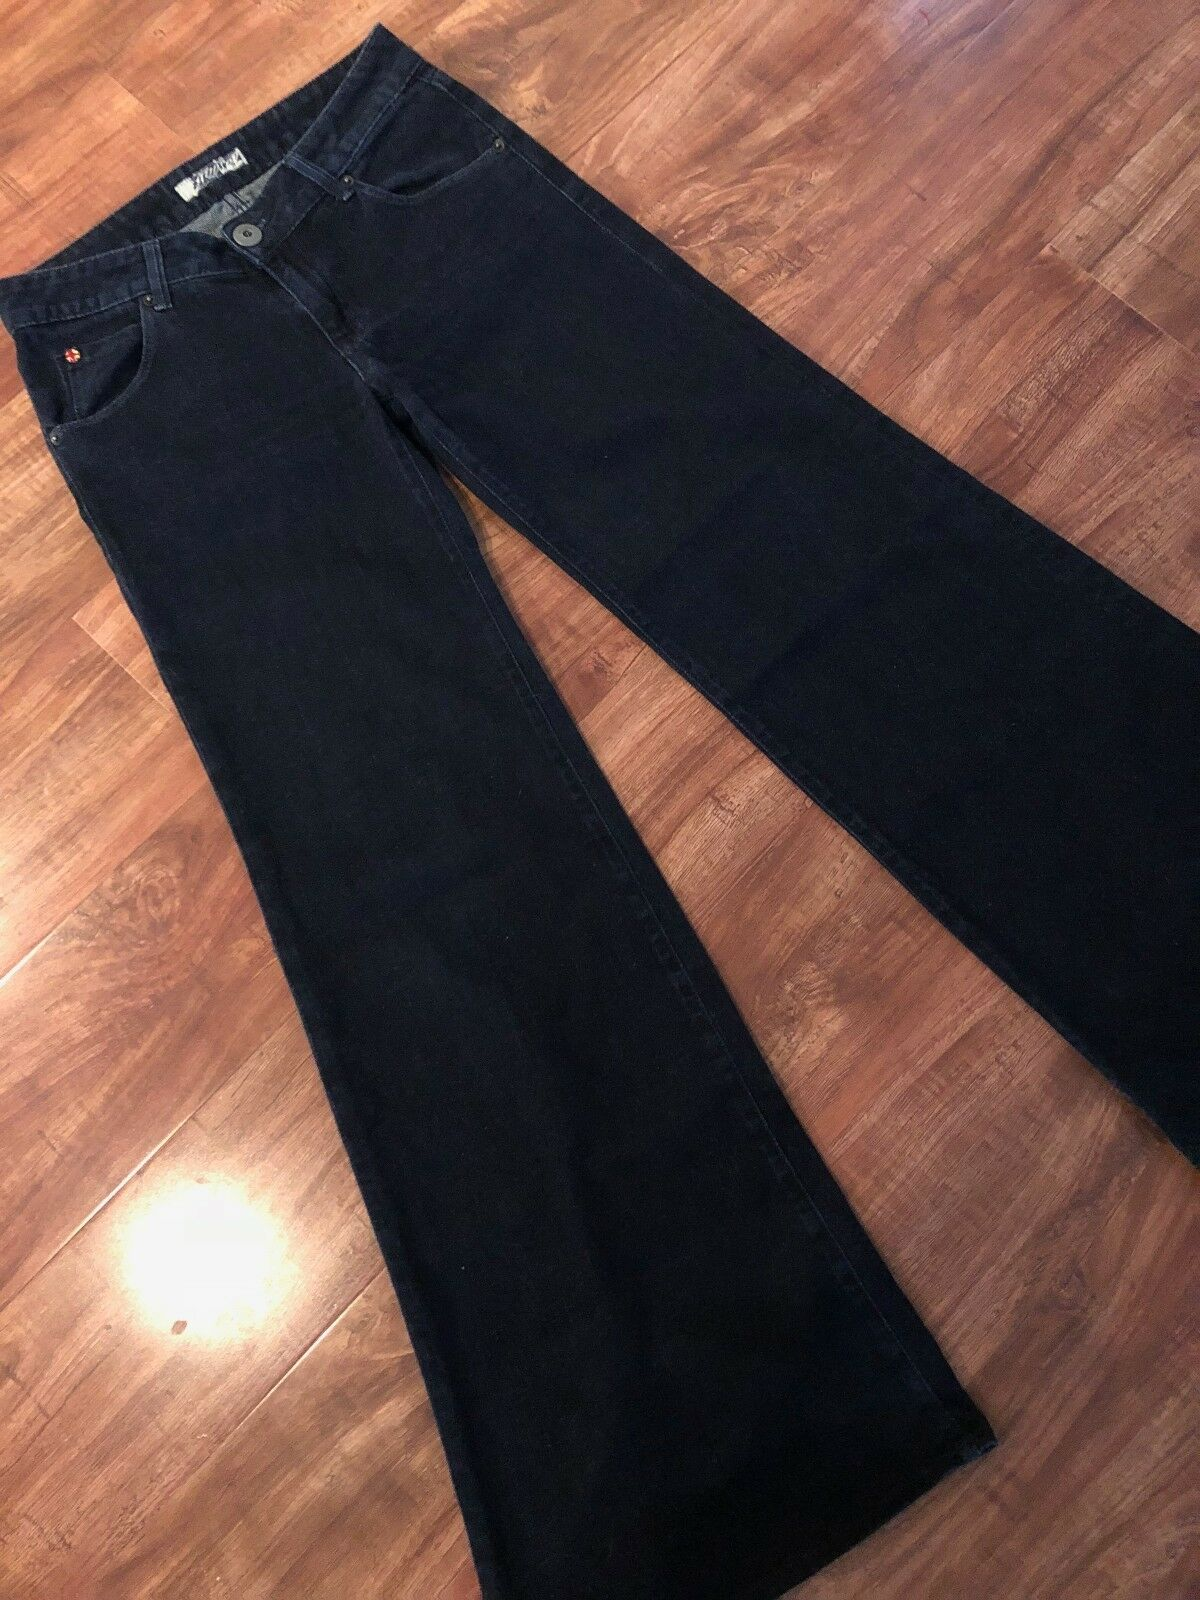 HUDSON Jeans Trousers Women's Super Wide Leg Mid Rise Dark bluee Wash Size 27